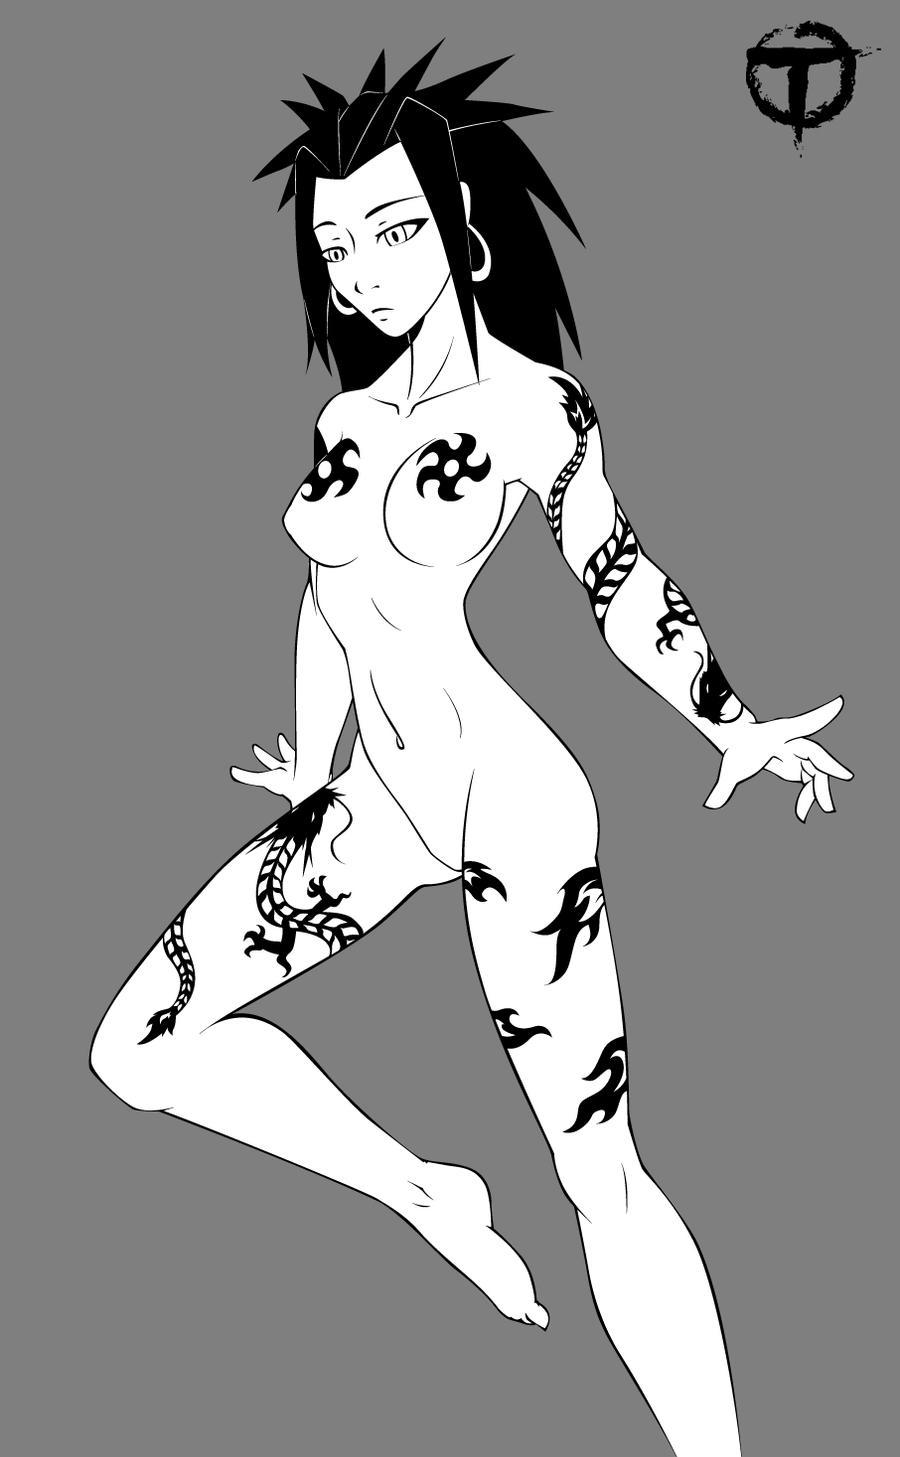 Hisa by pyrasterran